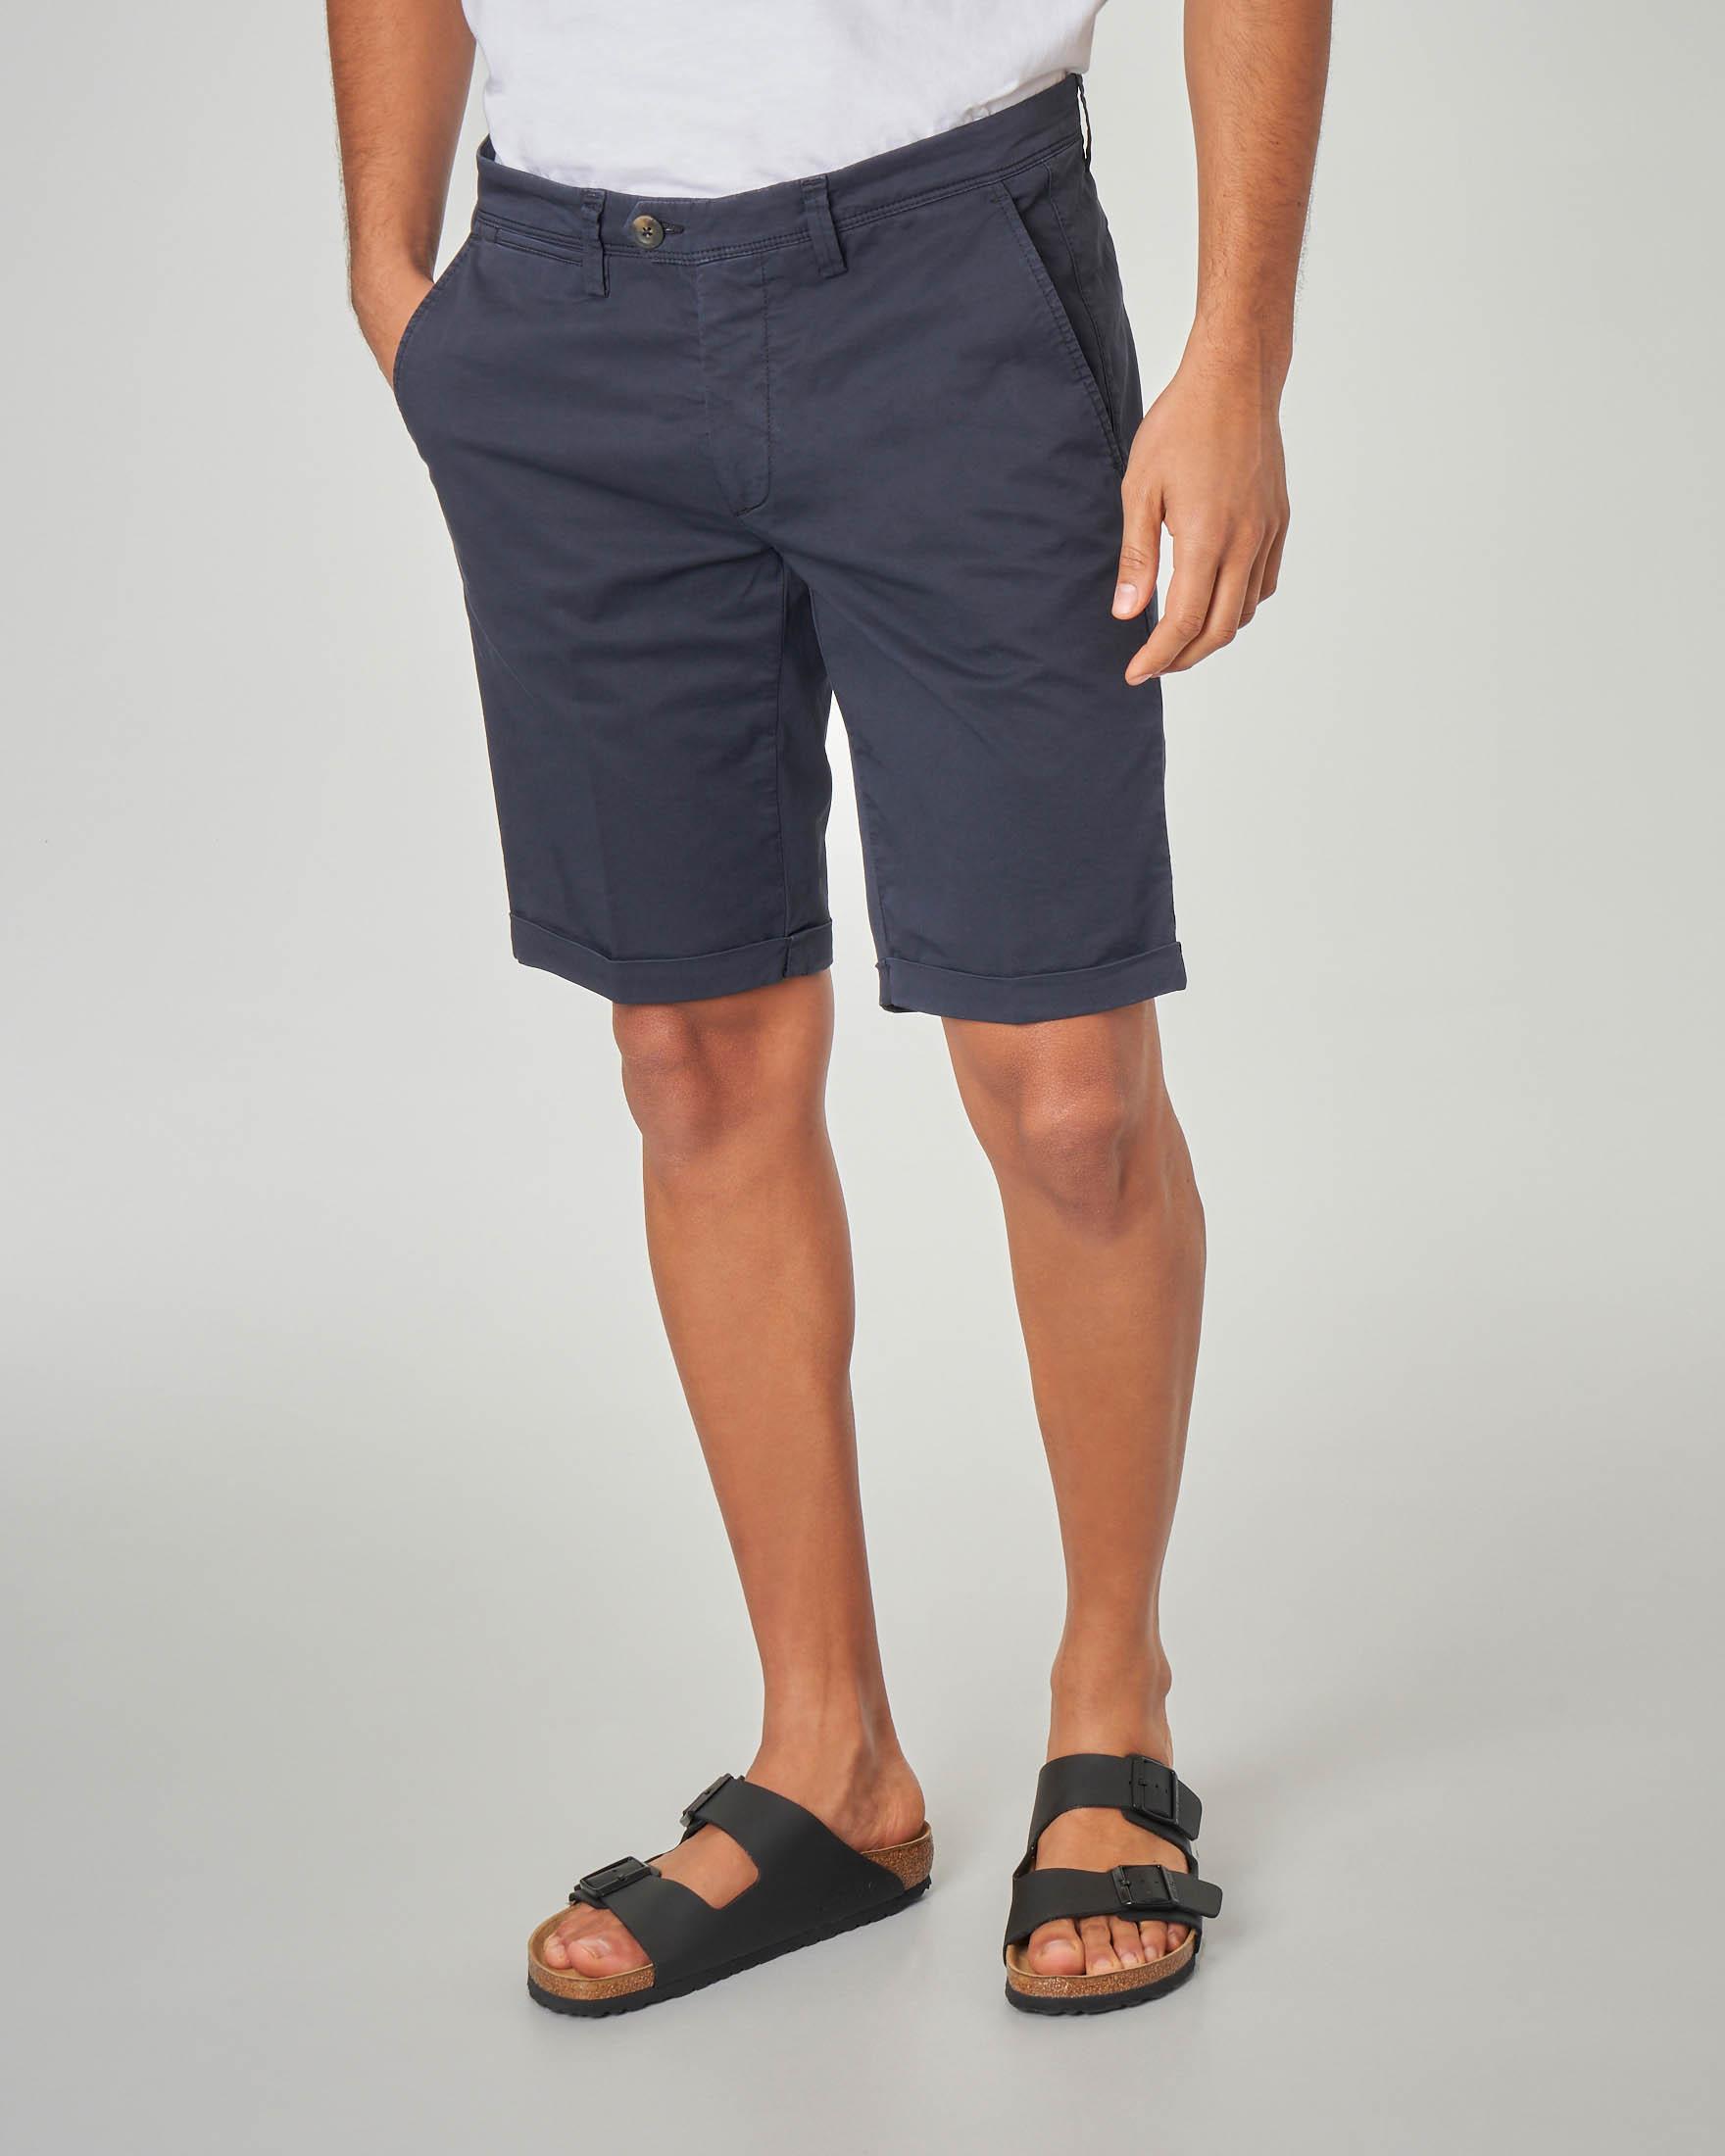 Bermuda chino blu in gabardina stretch